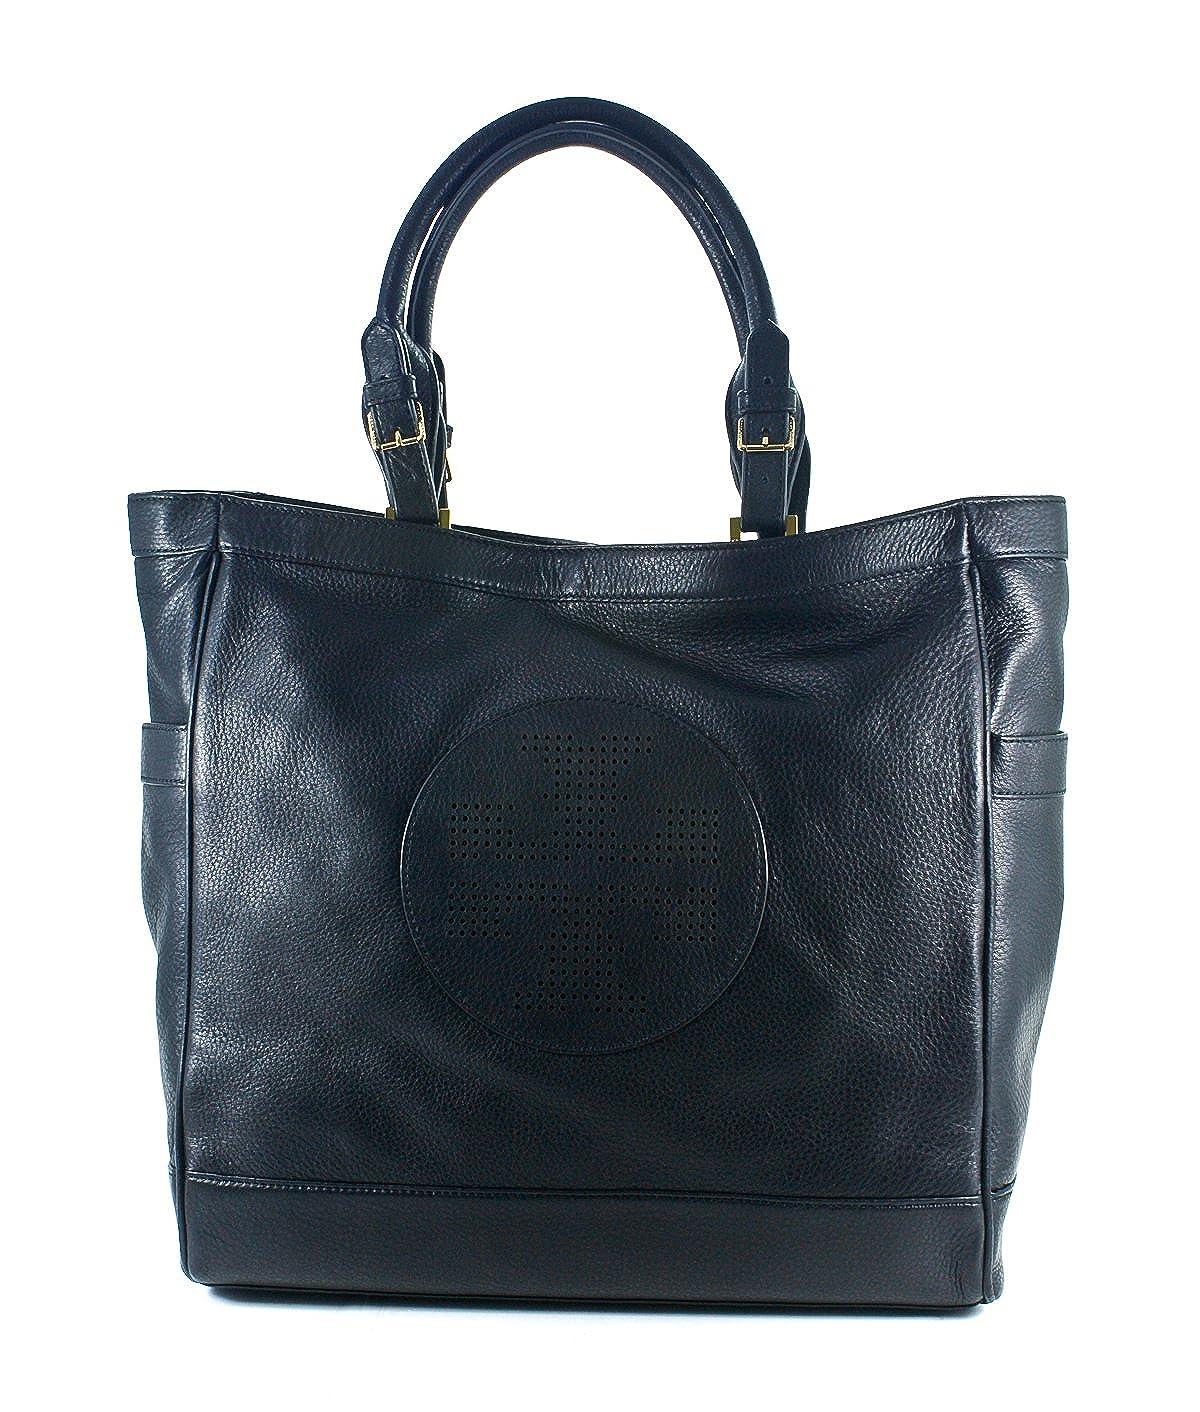 58ce3c70925 Amazon.com  Tory Burch Kipp Tote Bag - Black  Clothing